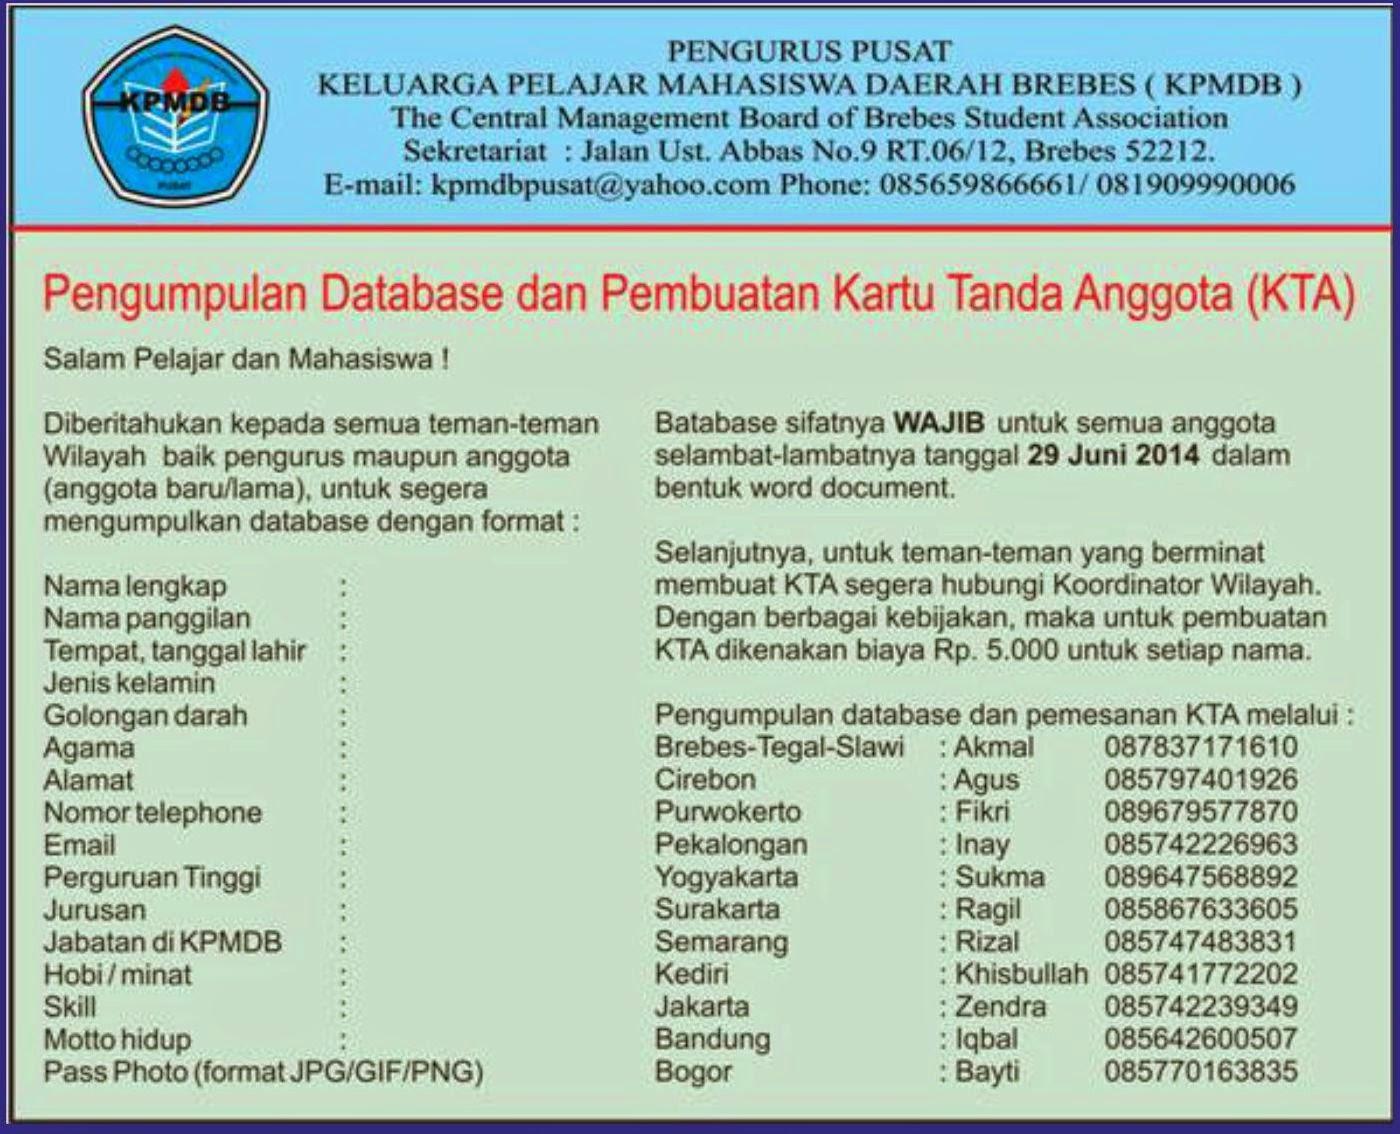 PENDATAAN ANGGOTA KPMDB